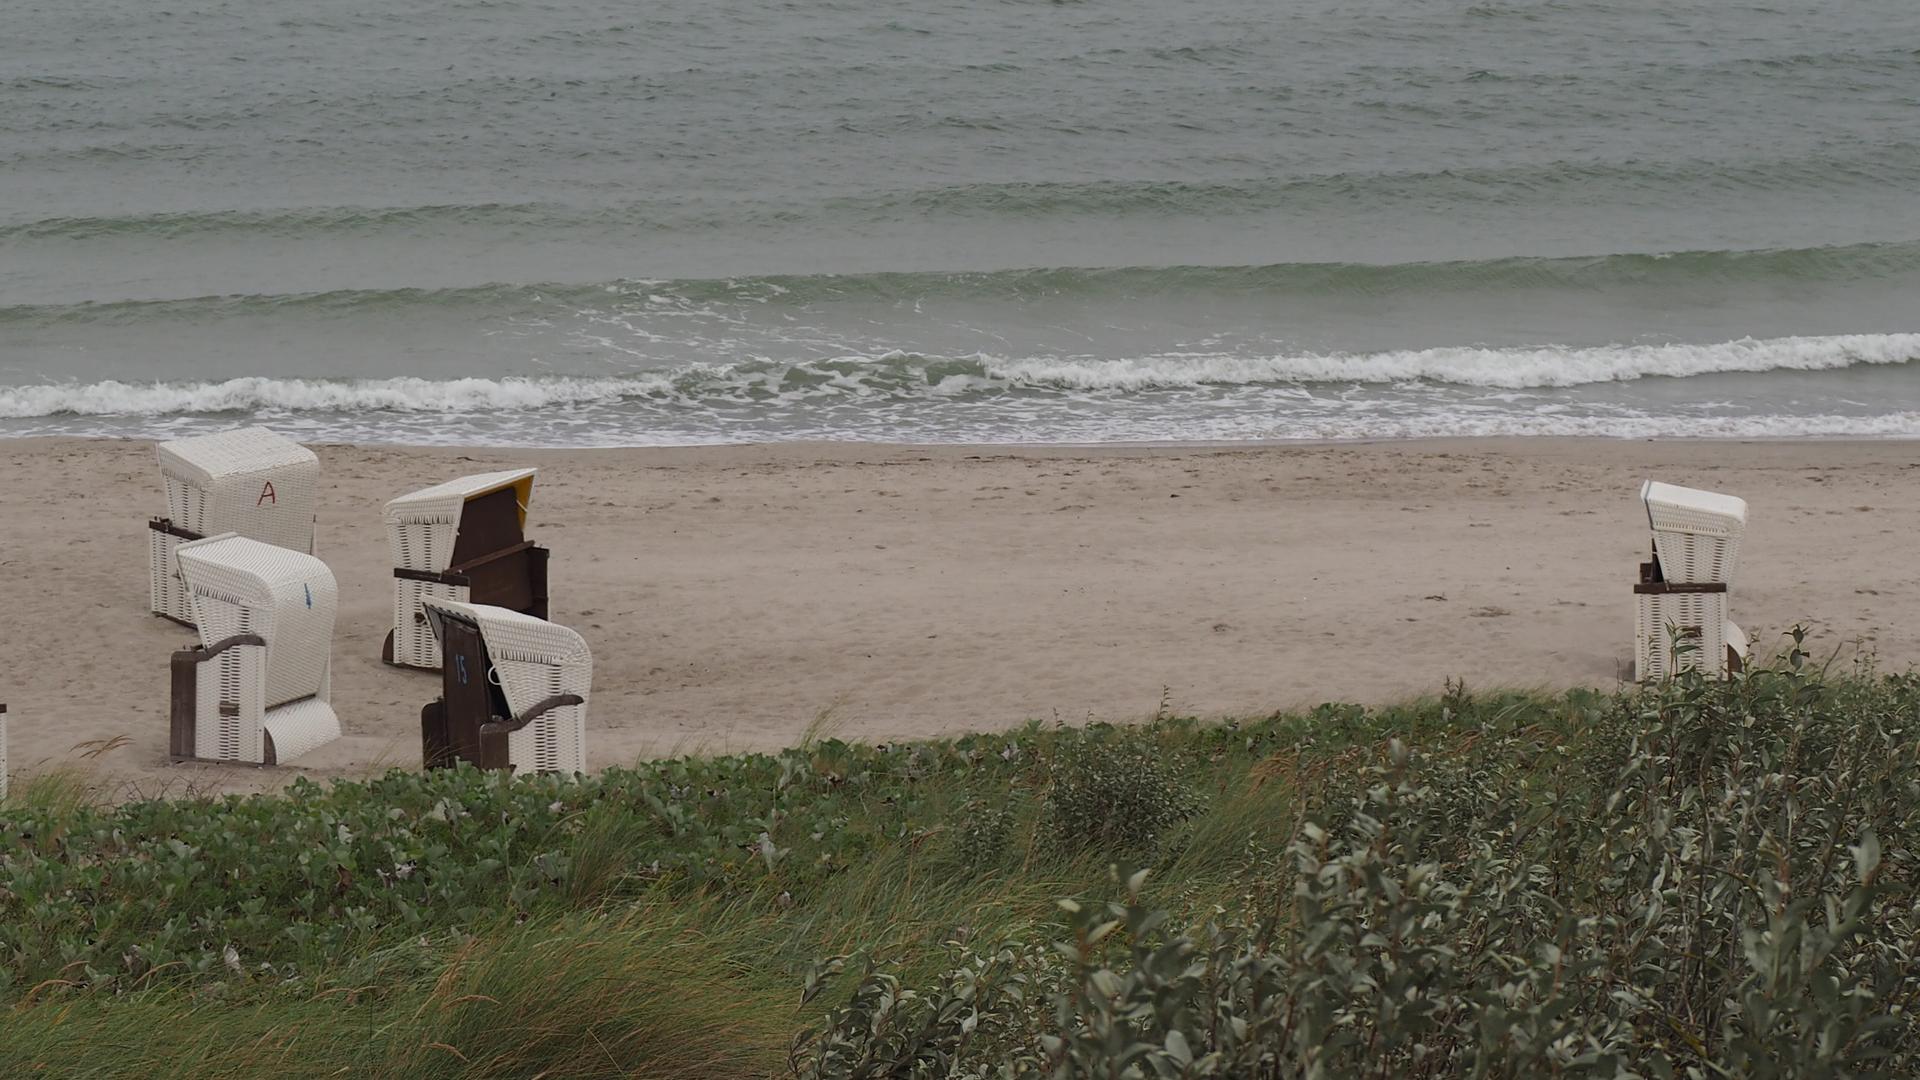 Strandkörbe am Strand.png